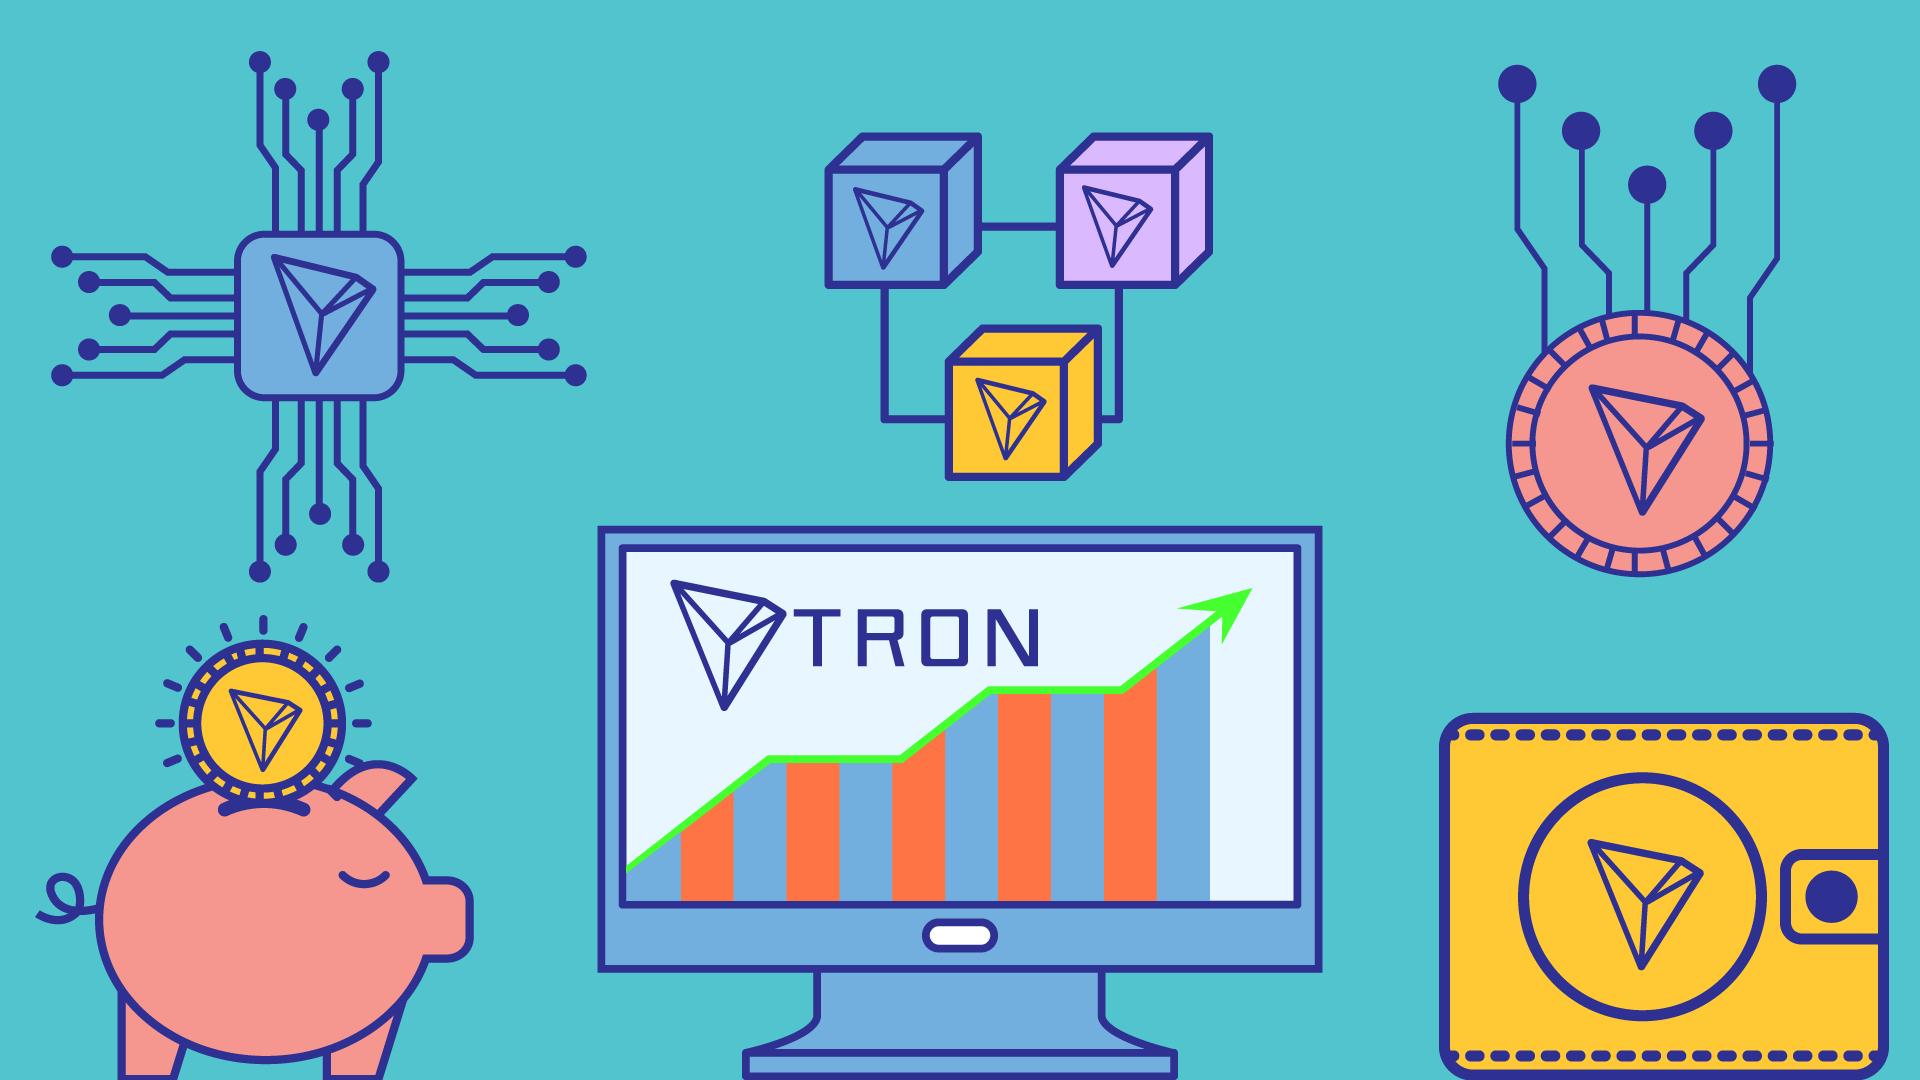 Tron Price News